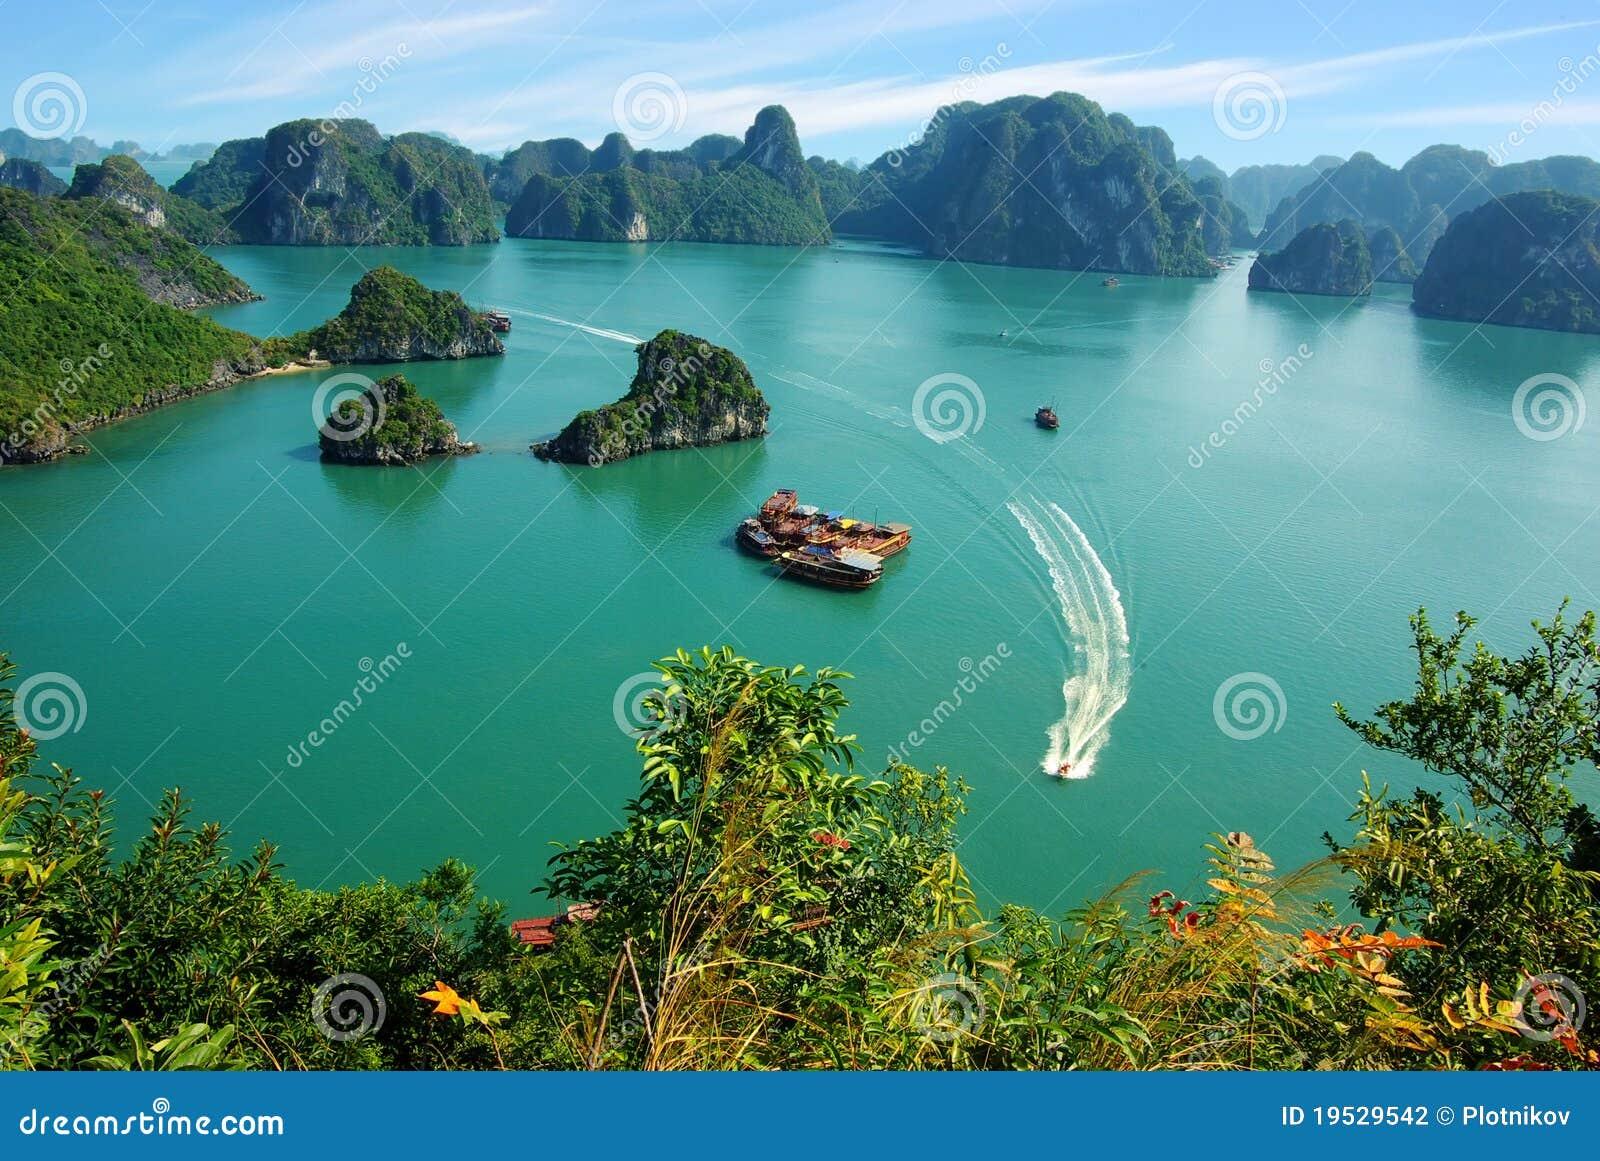 море Вьетнам ландшафта ha залива длиннее рисуночное